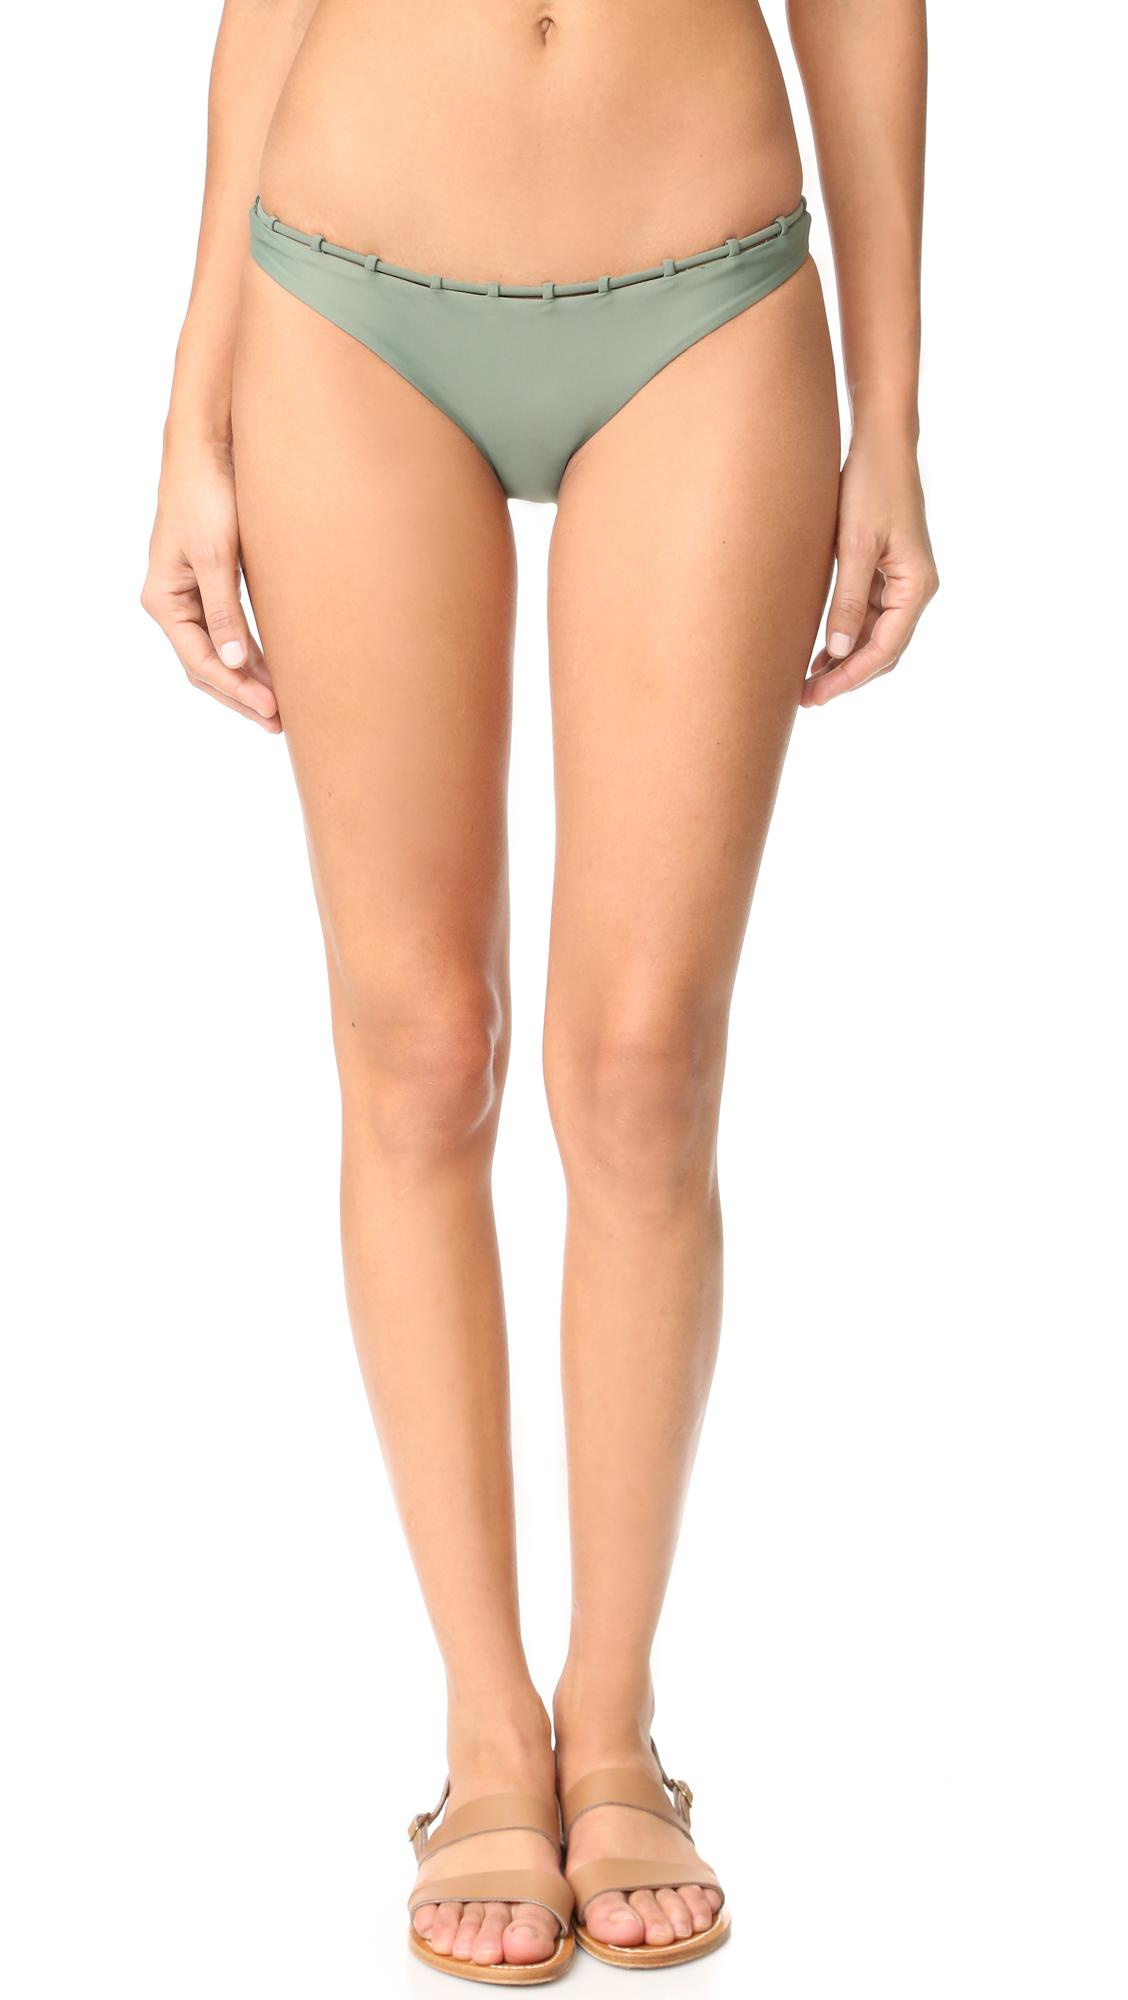 Jade Swim Chain Reaction Bottoms - Sage at Shopbop